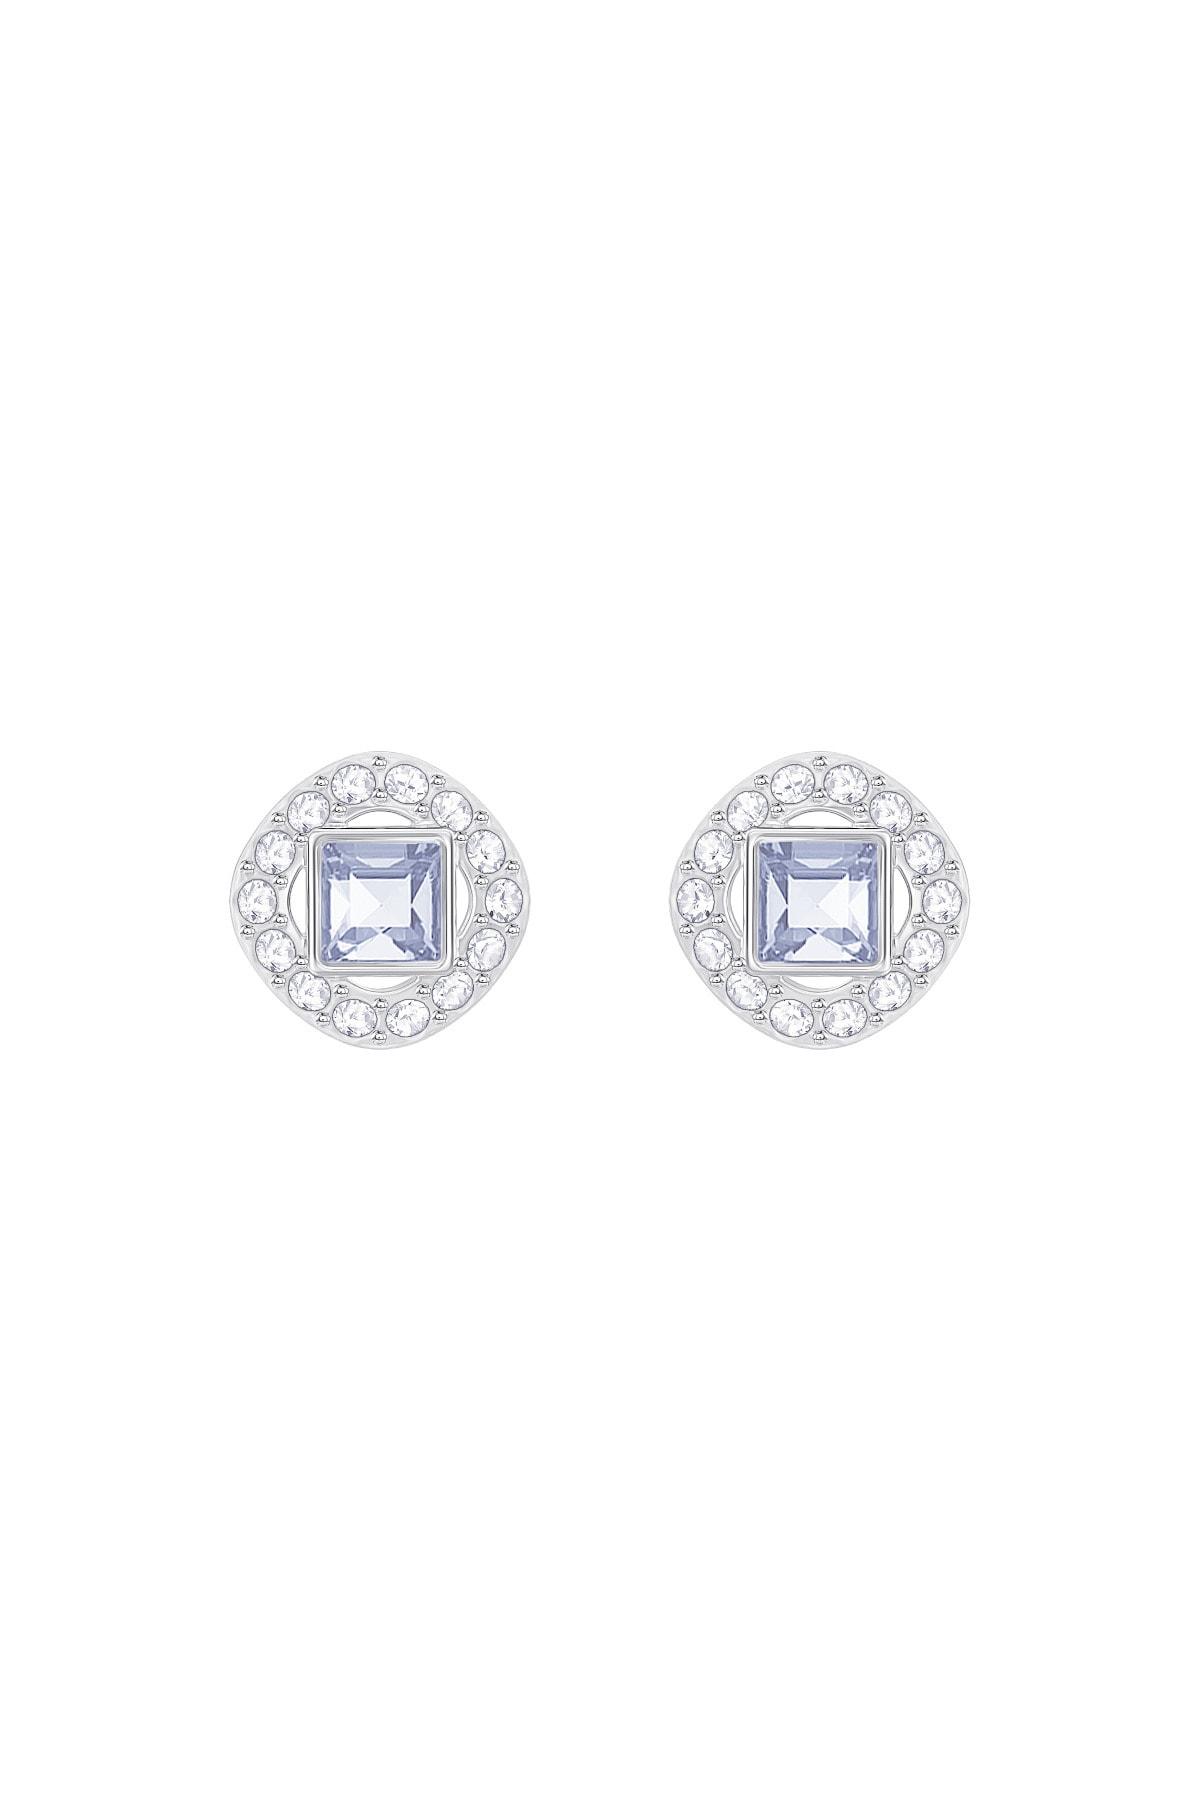 Swarovski Kadın Gümüş Zirkon Taşlı Küpe Angelic Square:pe Lsap/cry/rhs 5352048 1